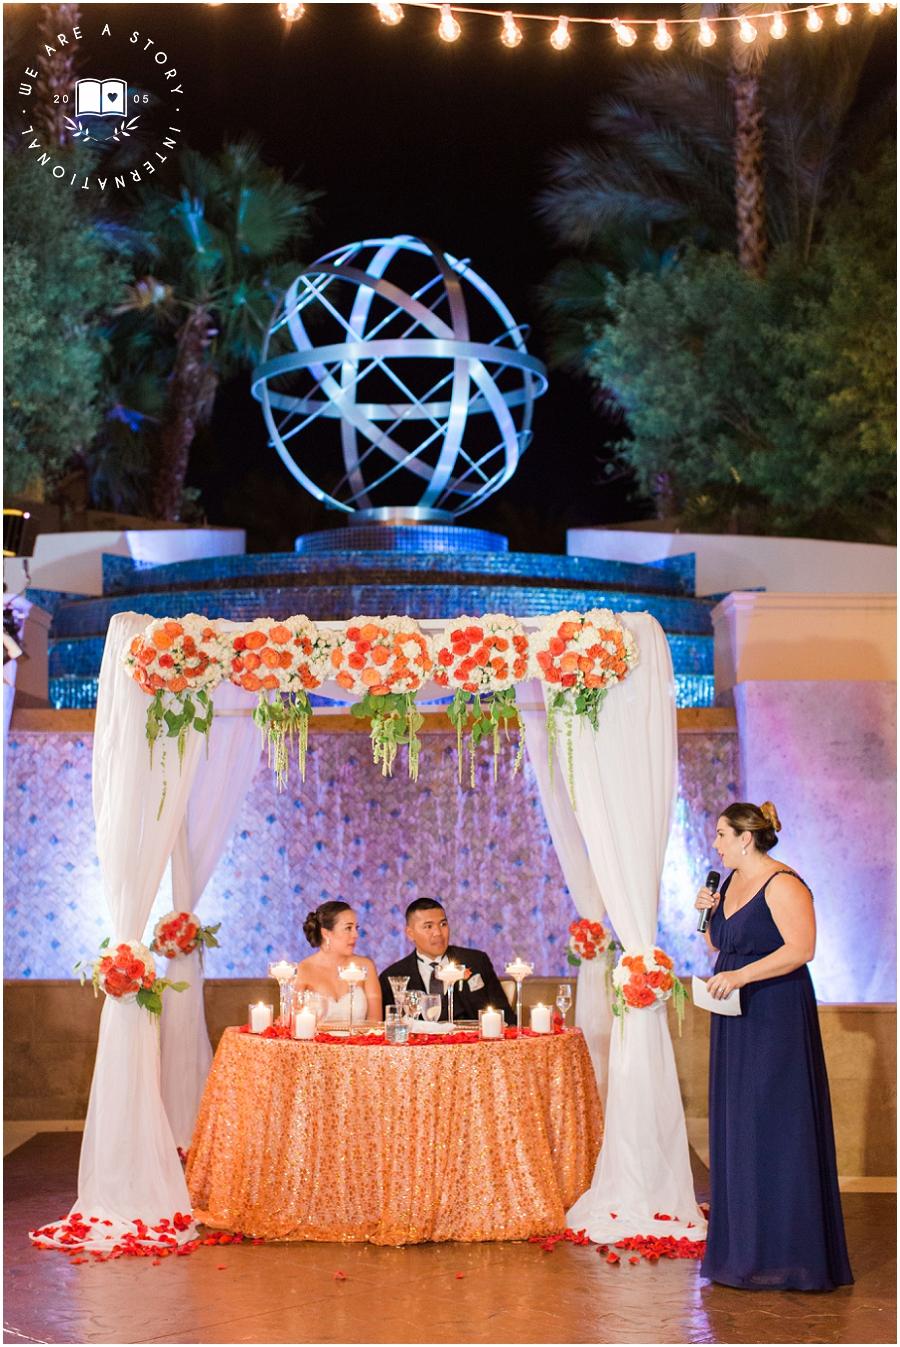 Four Seasons wedding photographer Las Vegas _ We Are A Story wedding photographer_2502.jpg